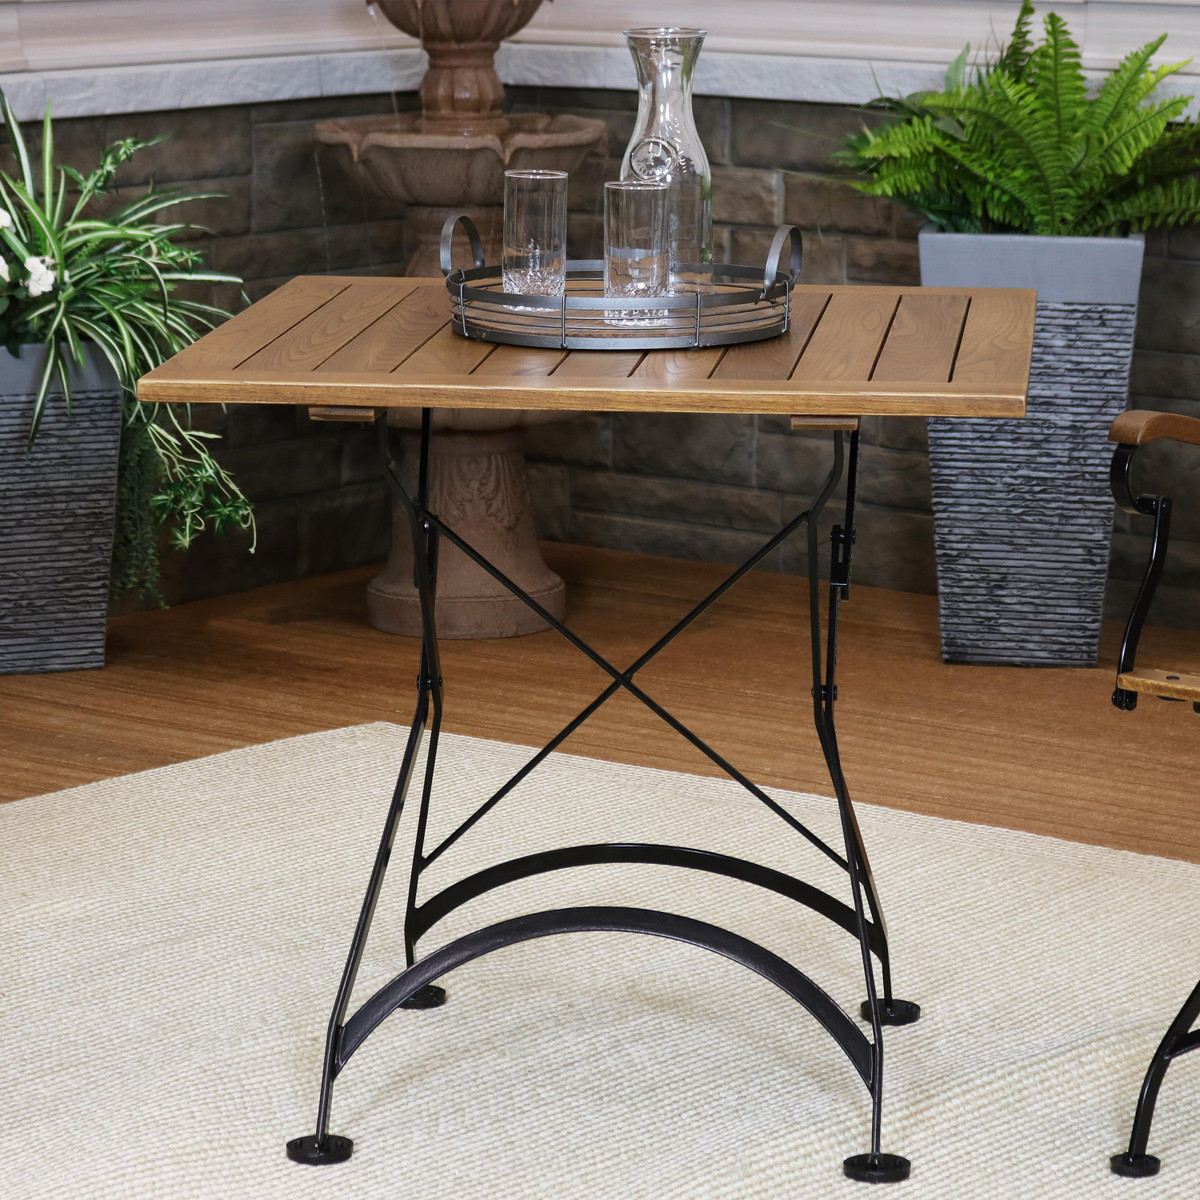 Picture of: Sunnydaze European Chestnut Wood Folding Square Bistro Table 32 Square